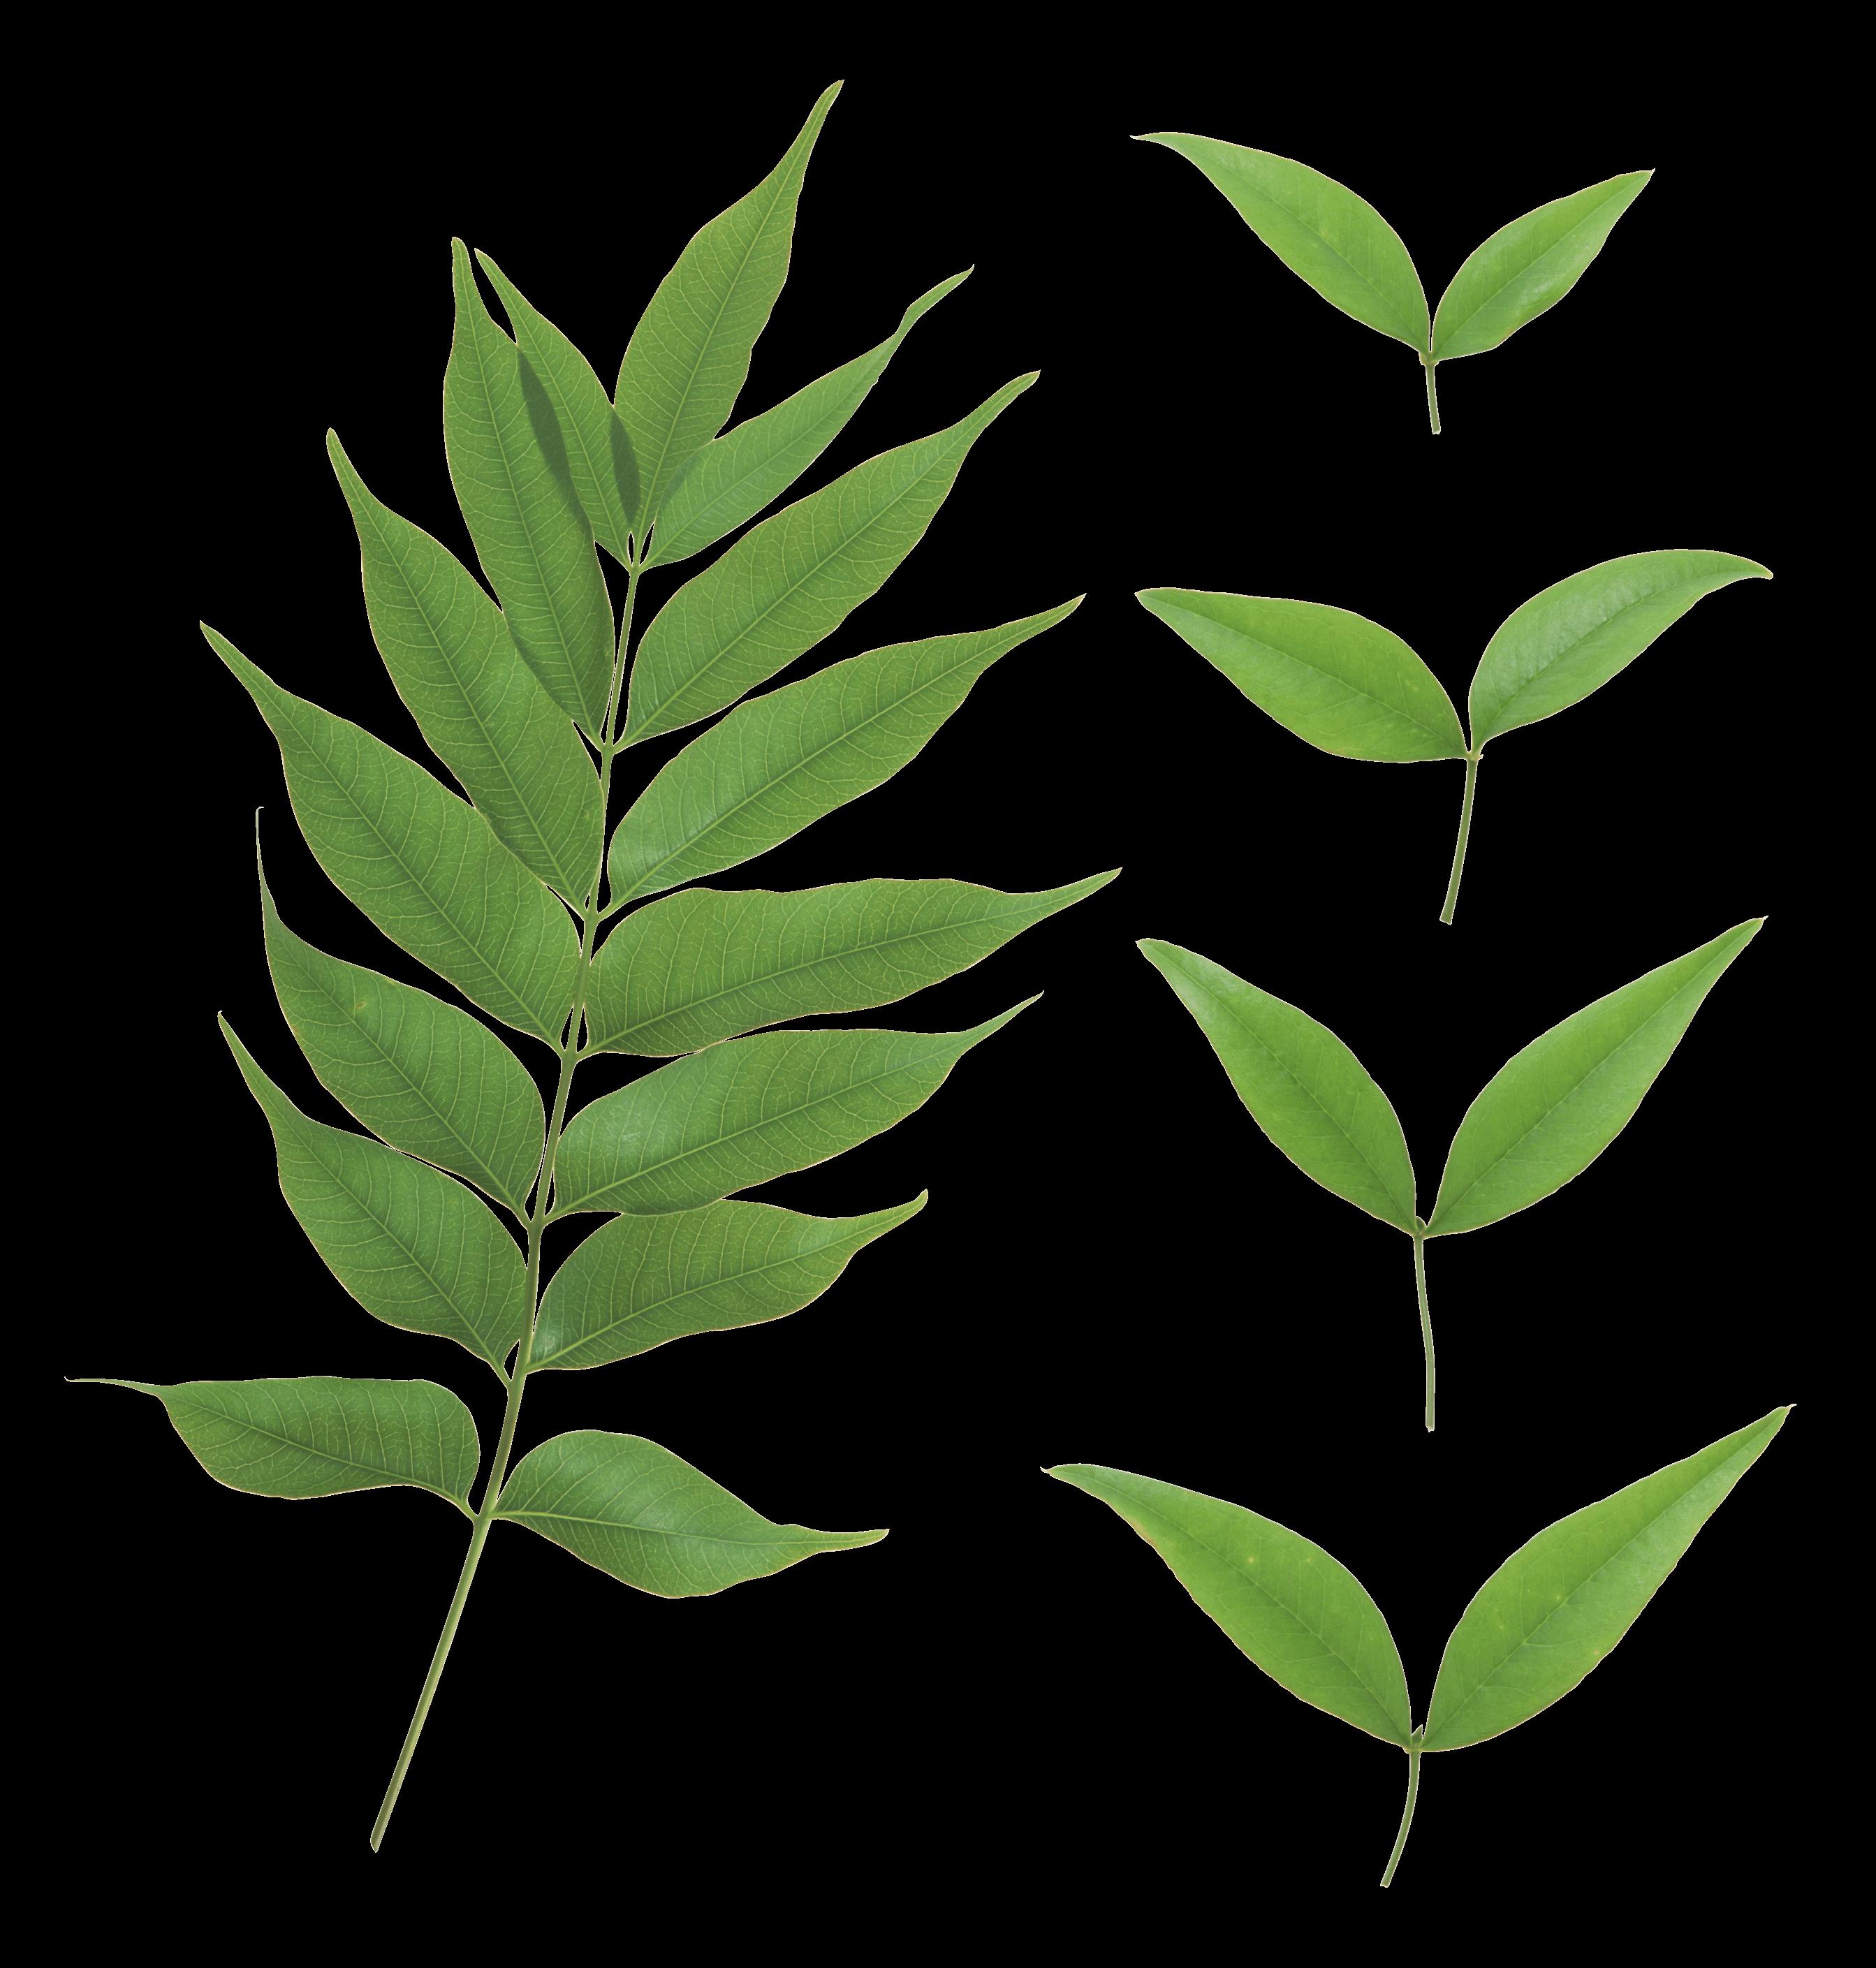 Green Leaf Png Png Image - Leaves, Transparent background PNG HD thumbnail